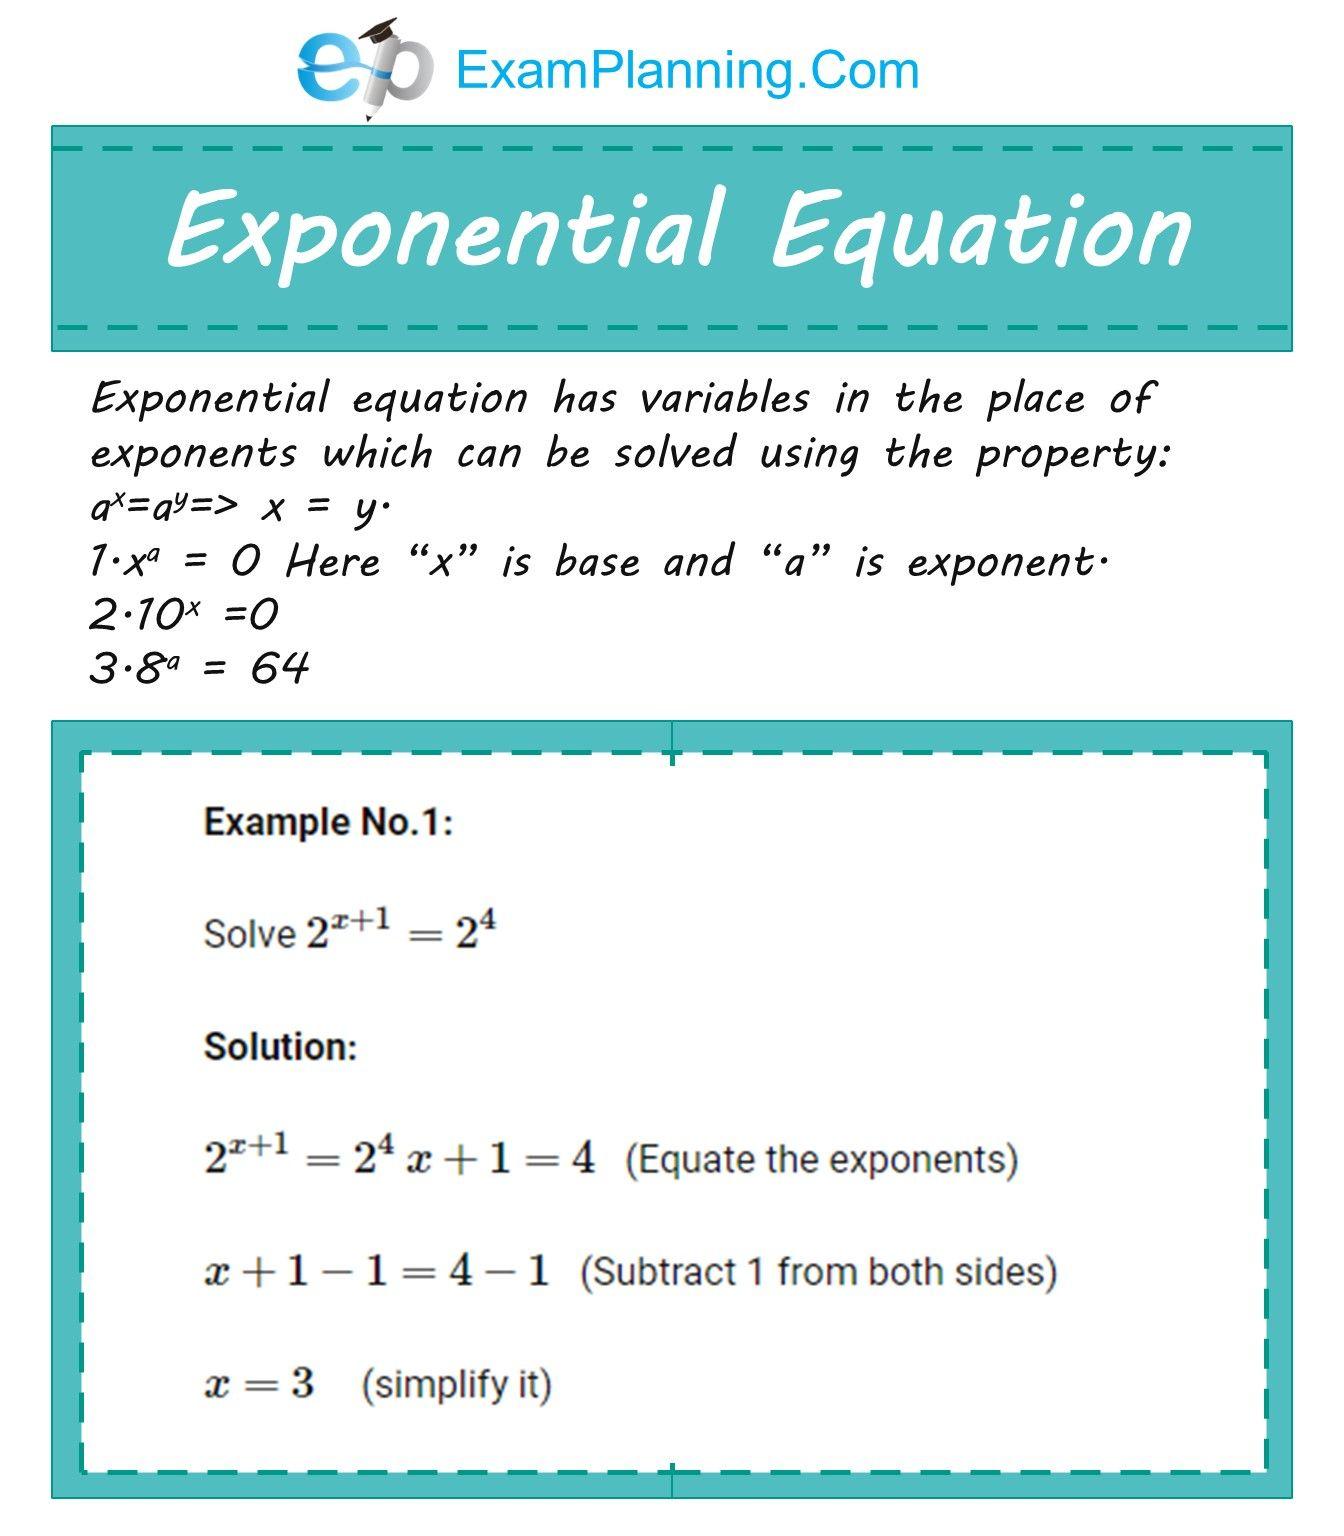 Exponential Equation Matematika